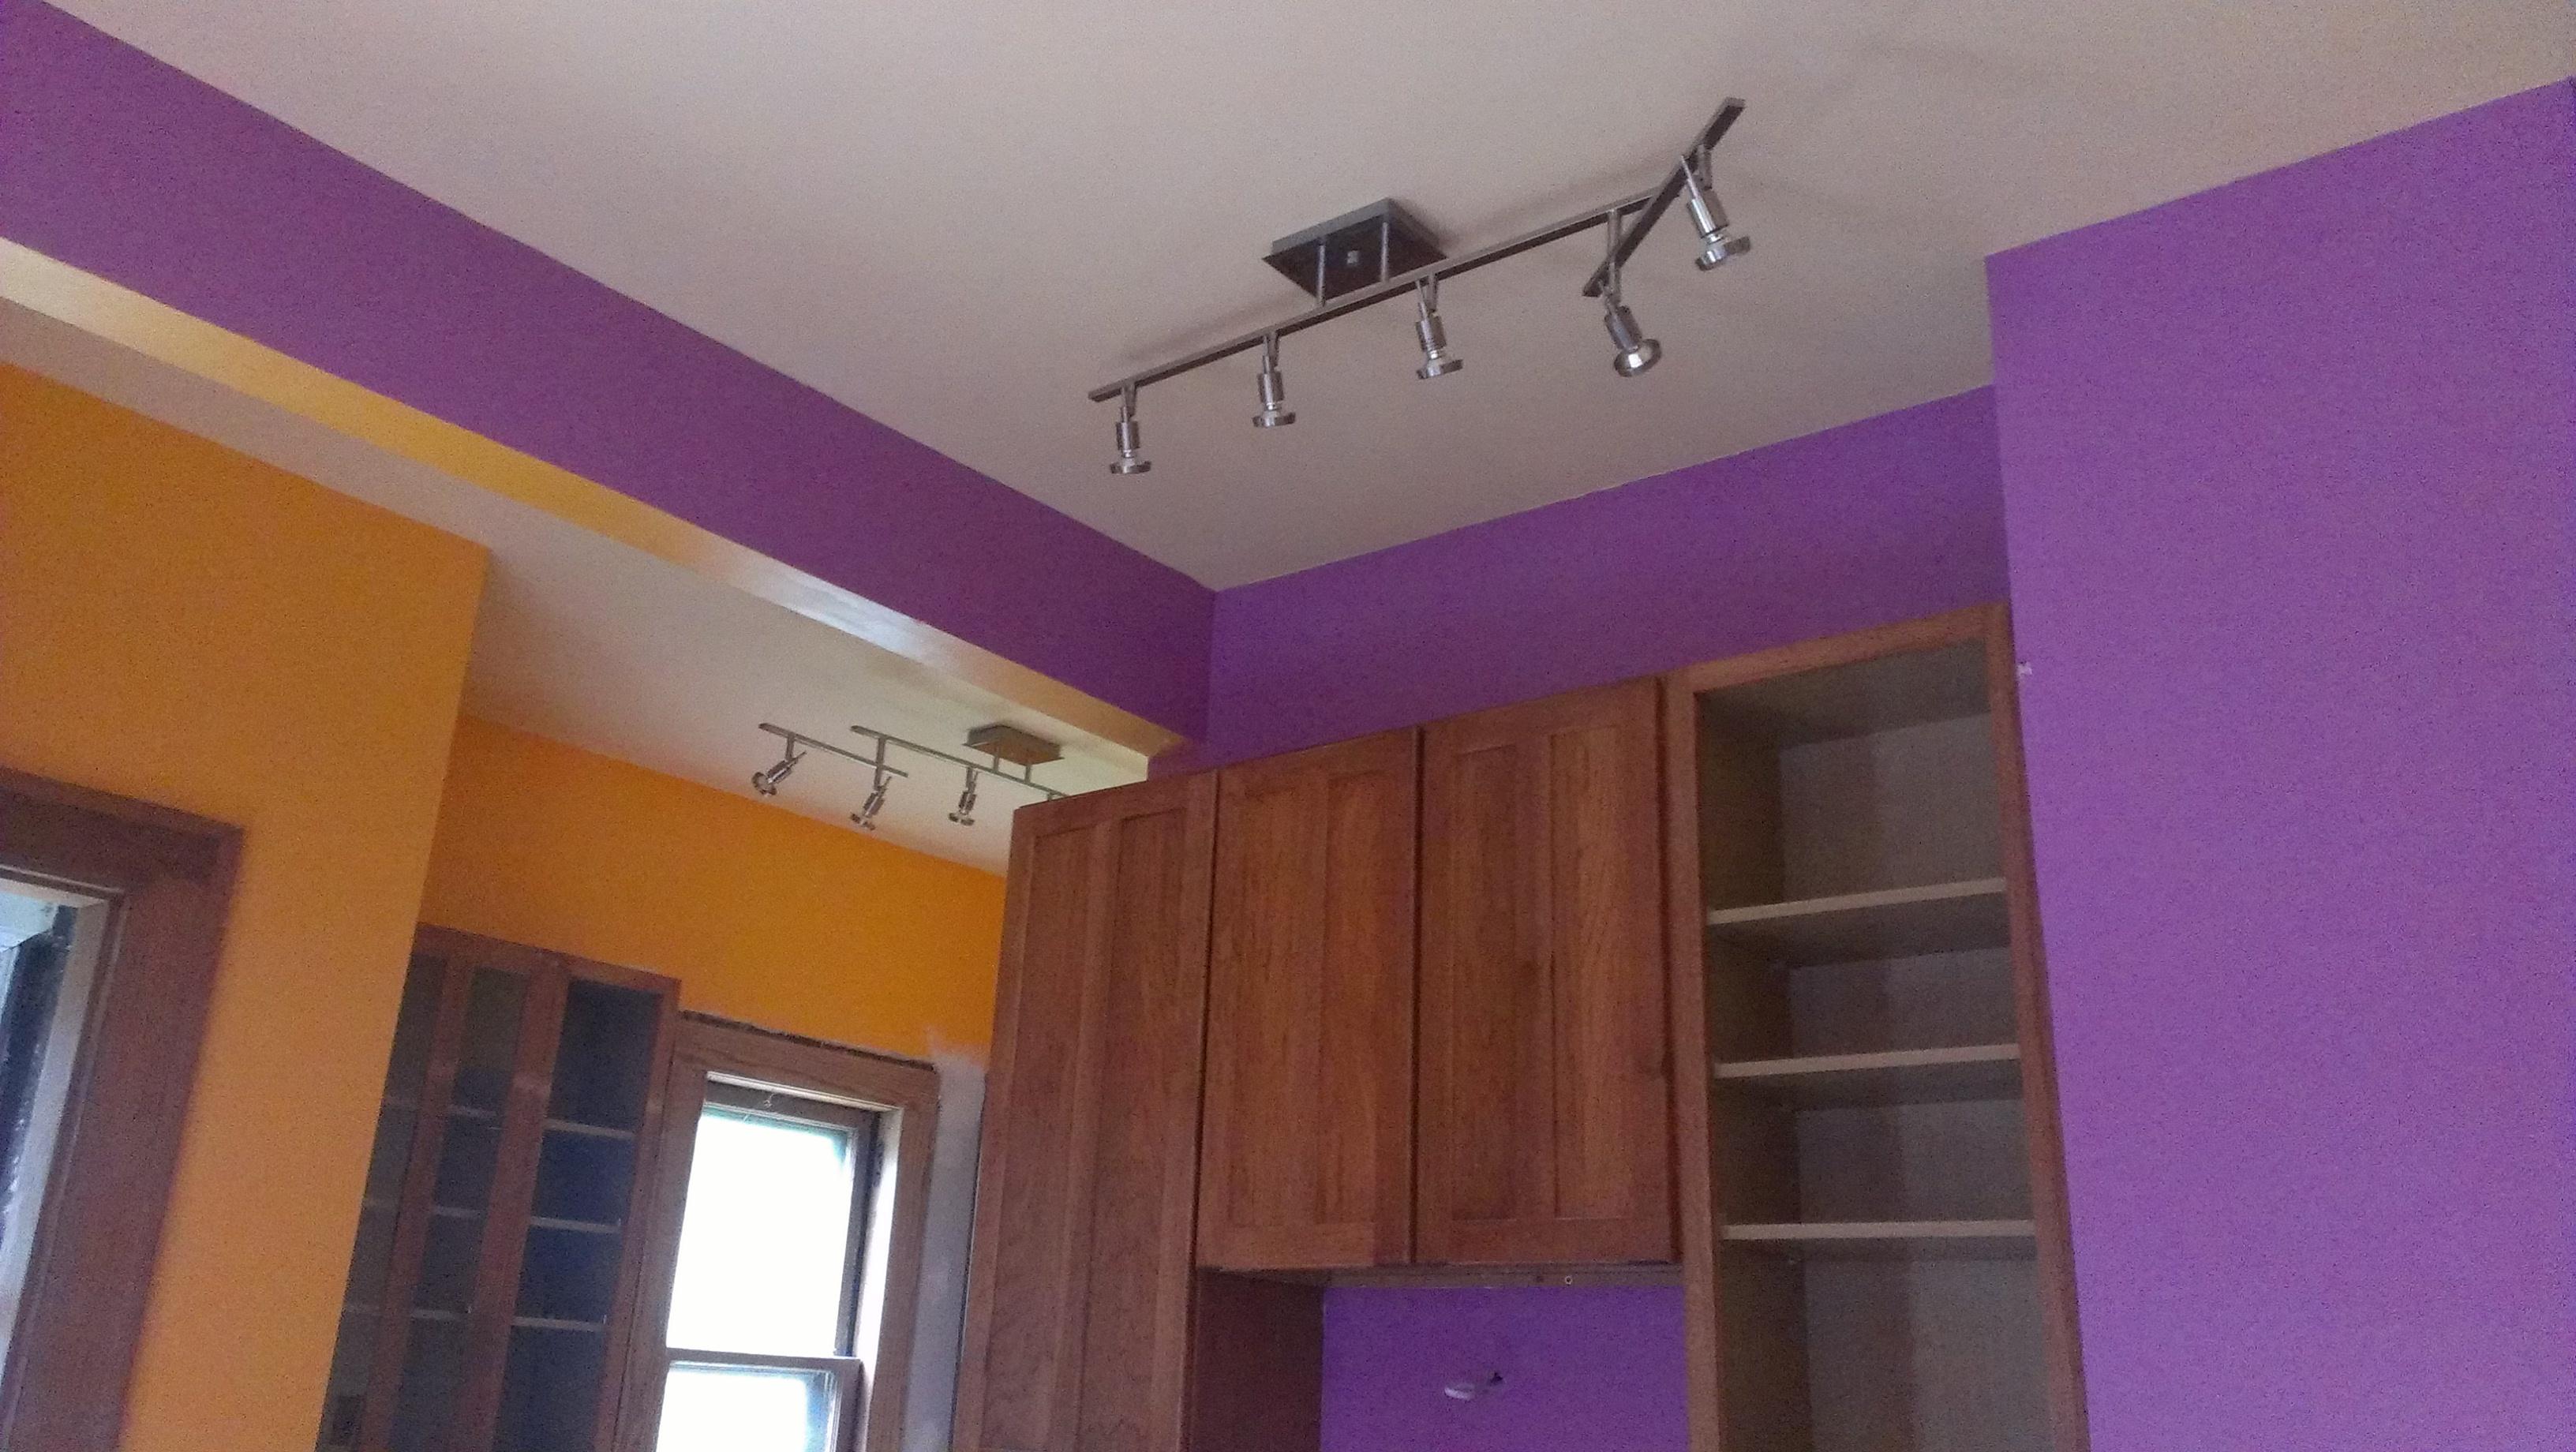 The Kitchen!